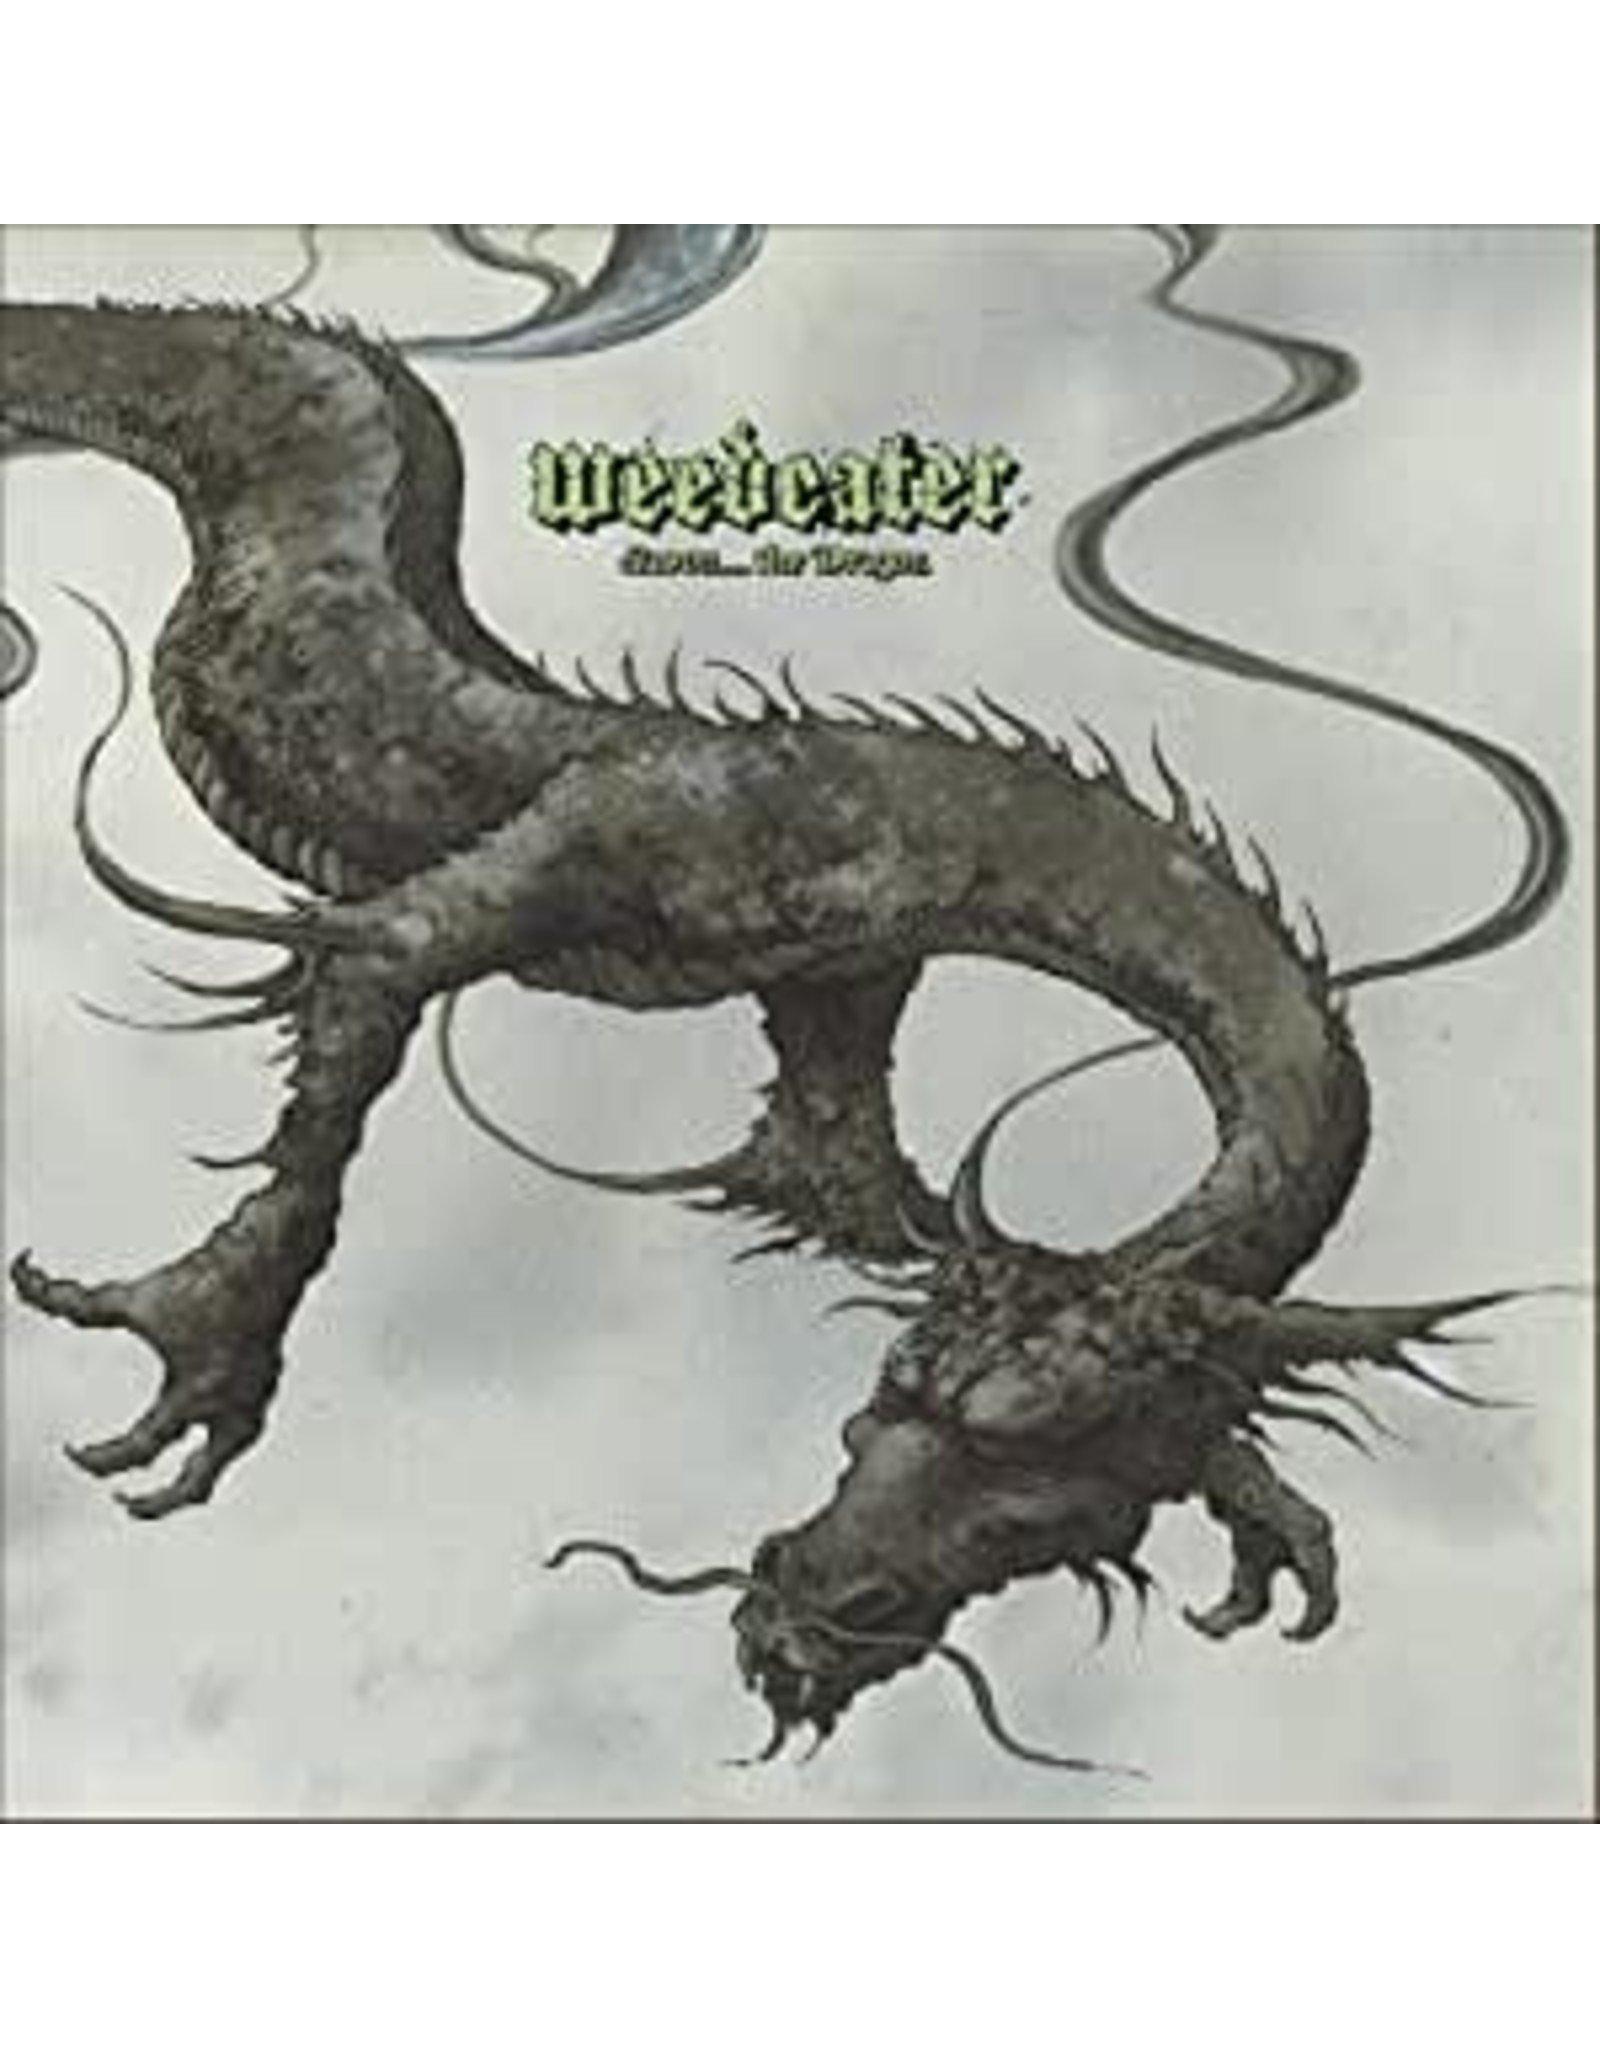 Weedeater - Jason...The Dragon Ltd Red LP